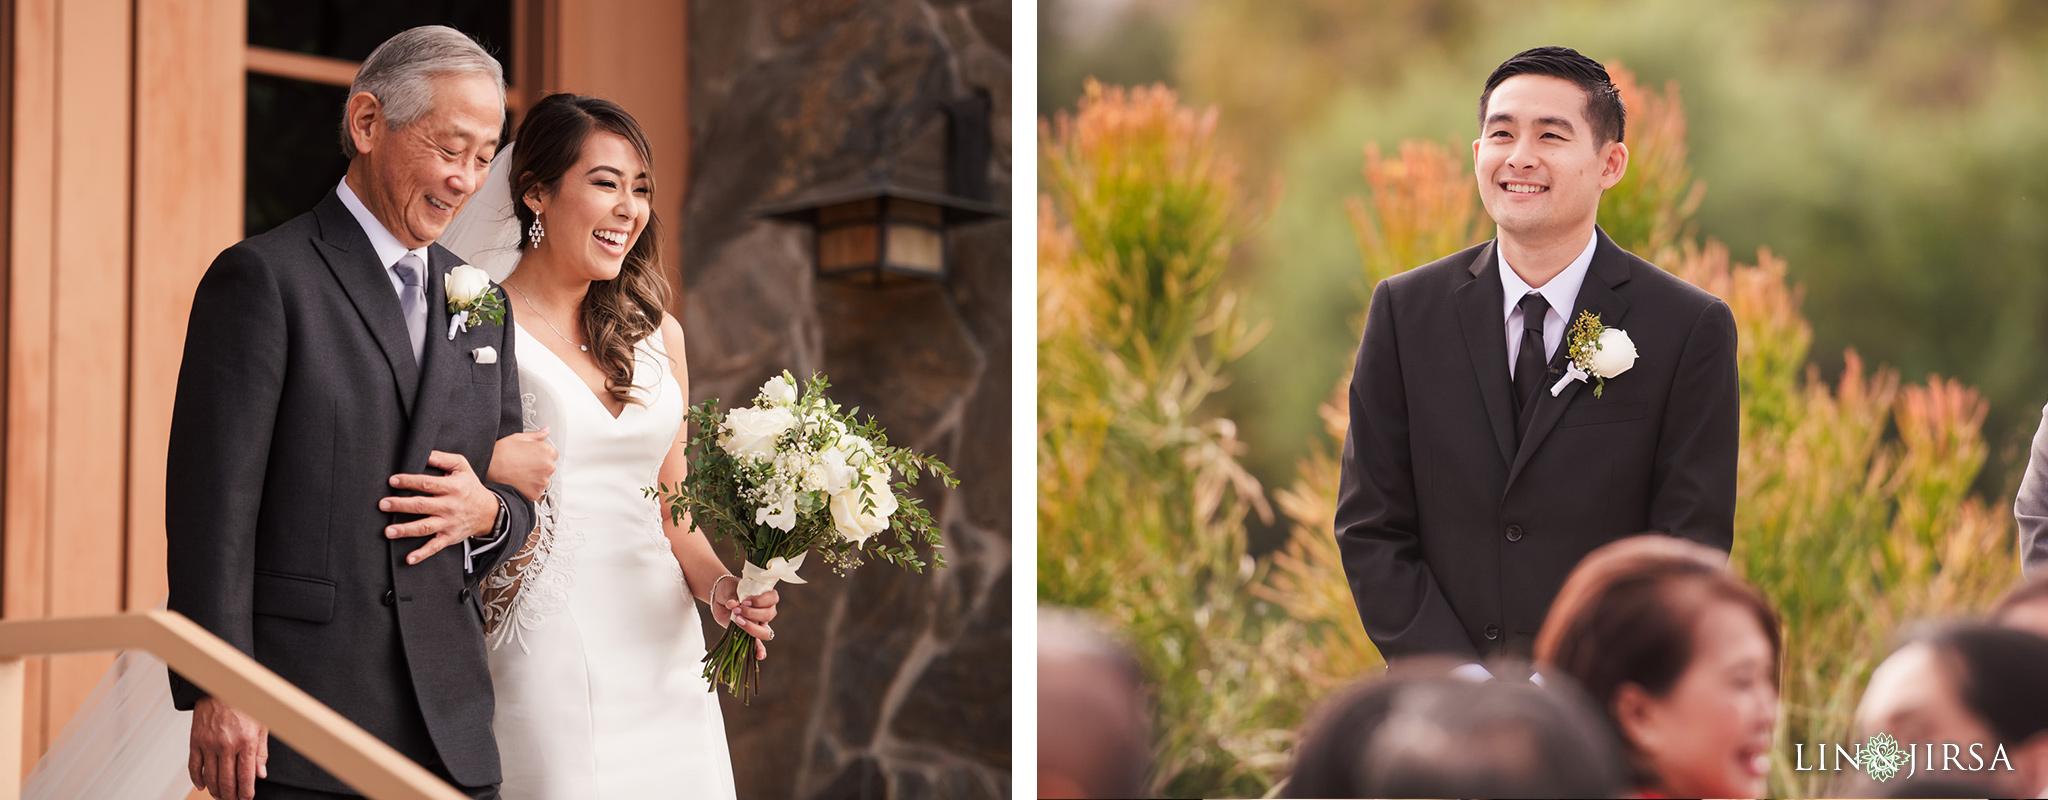 Coto de Caza Golf Club Wedding Photography Ceremony Aisle Walk